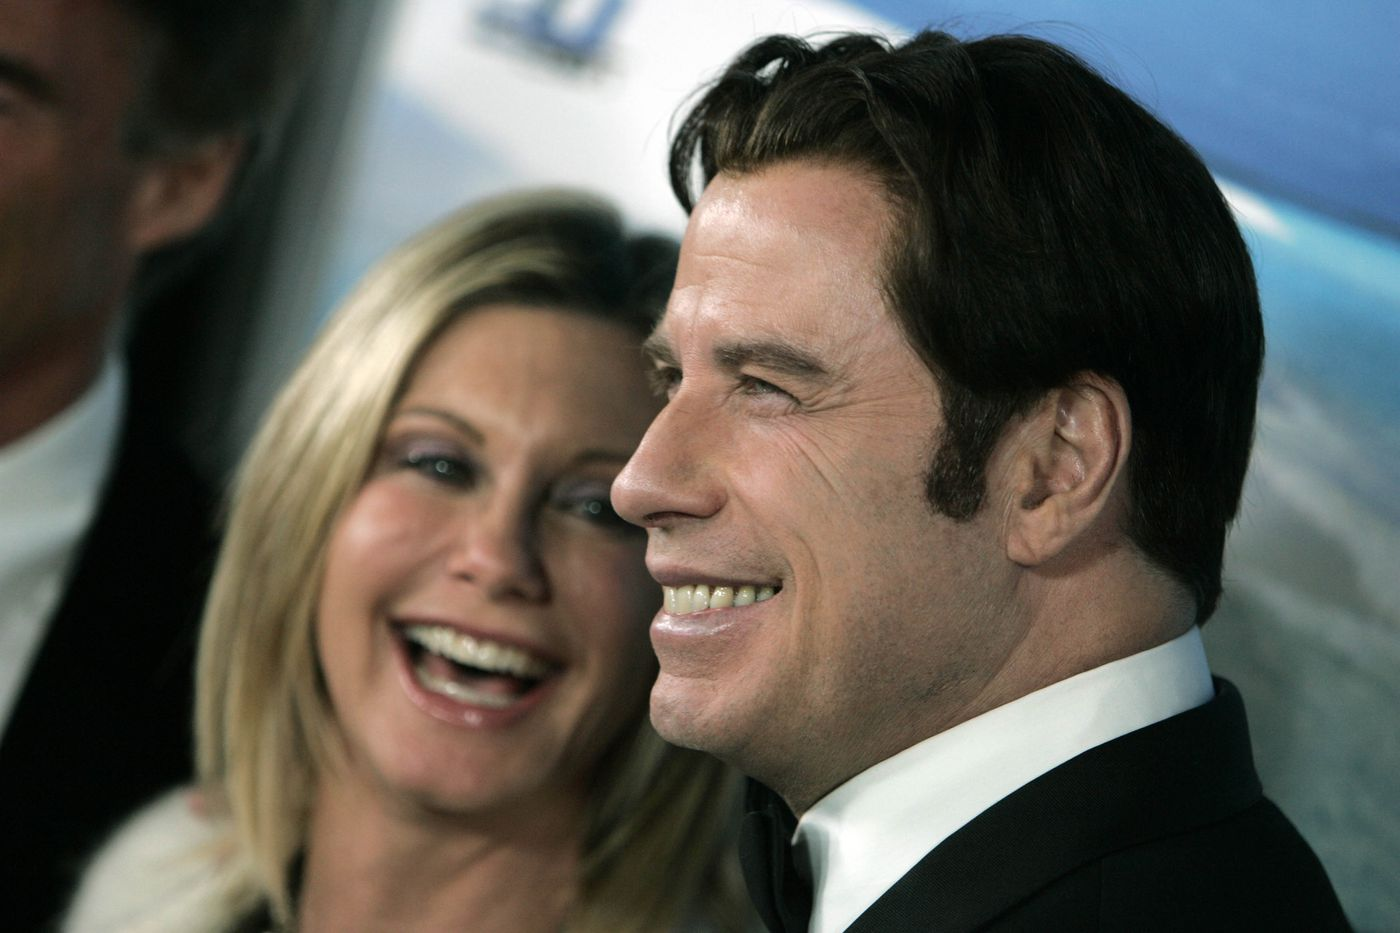 John Travolta, Oliva Newton-John are back together as Danny and Sandy